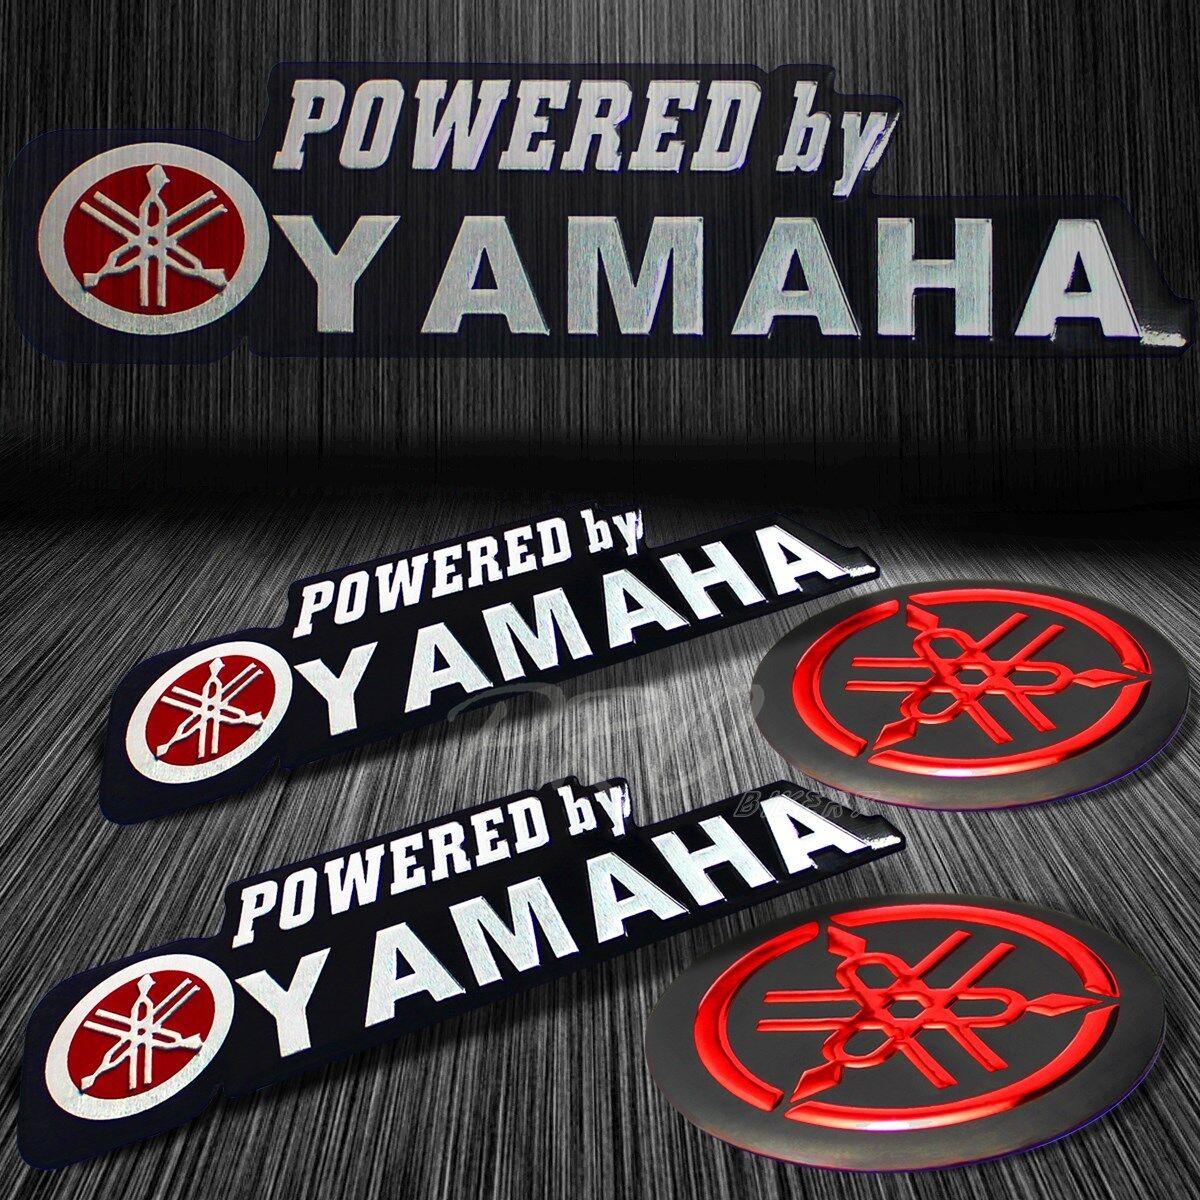 Details about metal 3d brushed chrome logo letter emblem red fairing sticker for yamaha decal